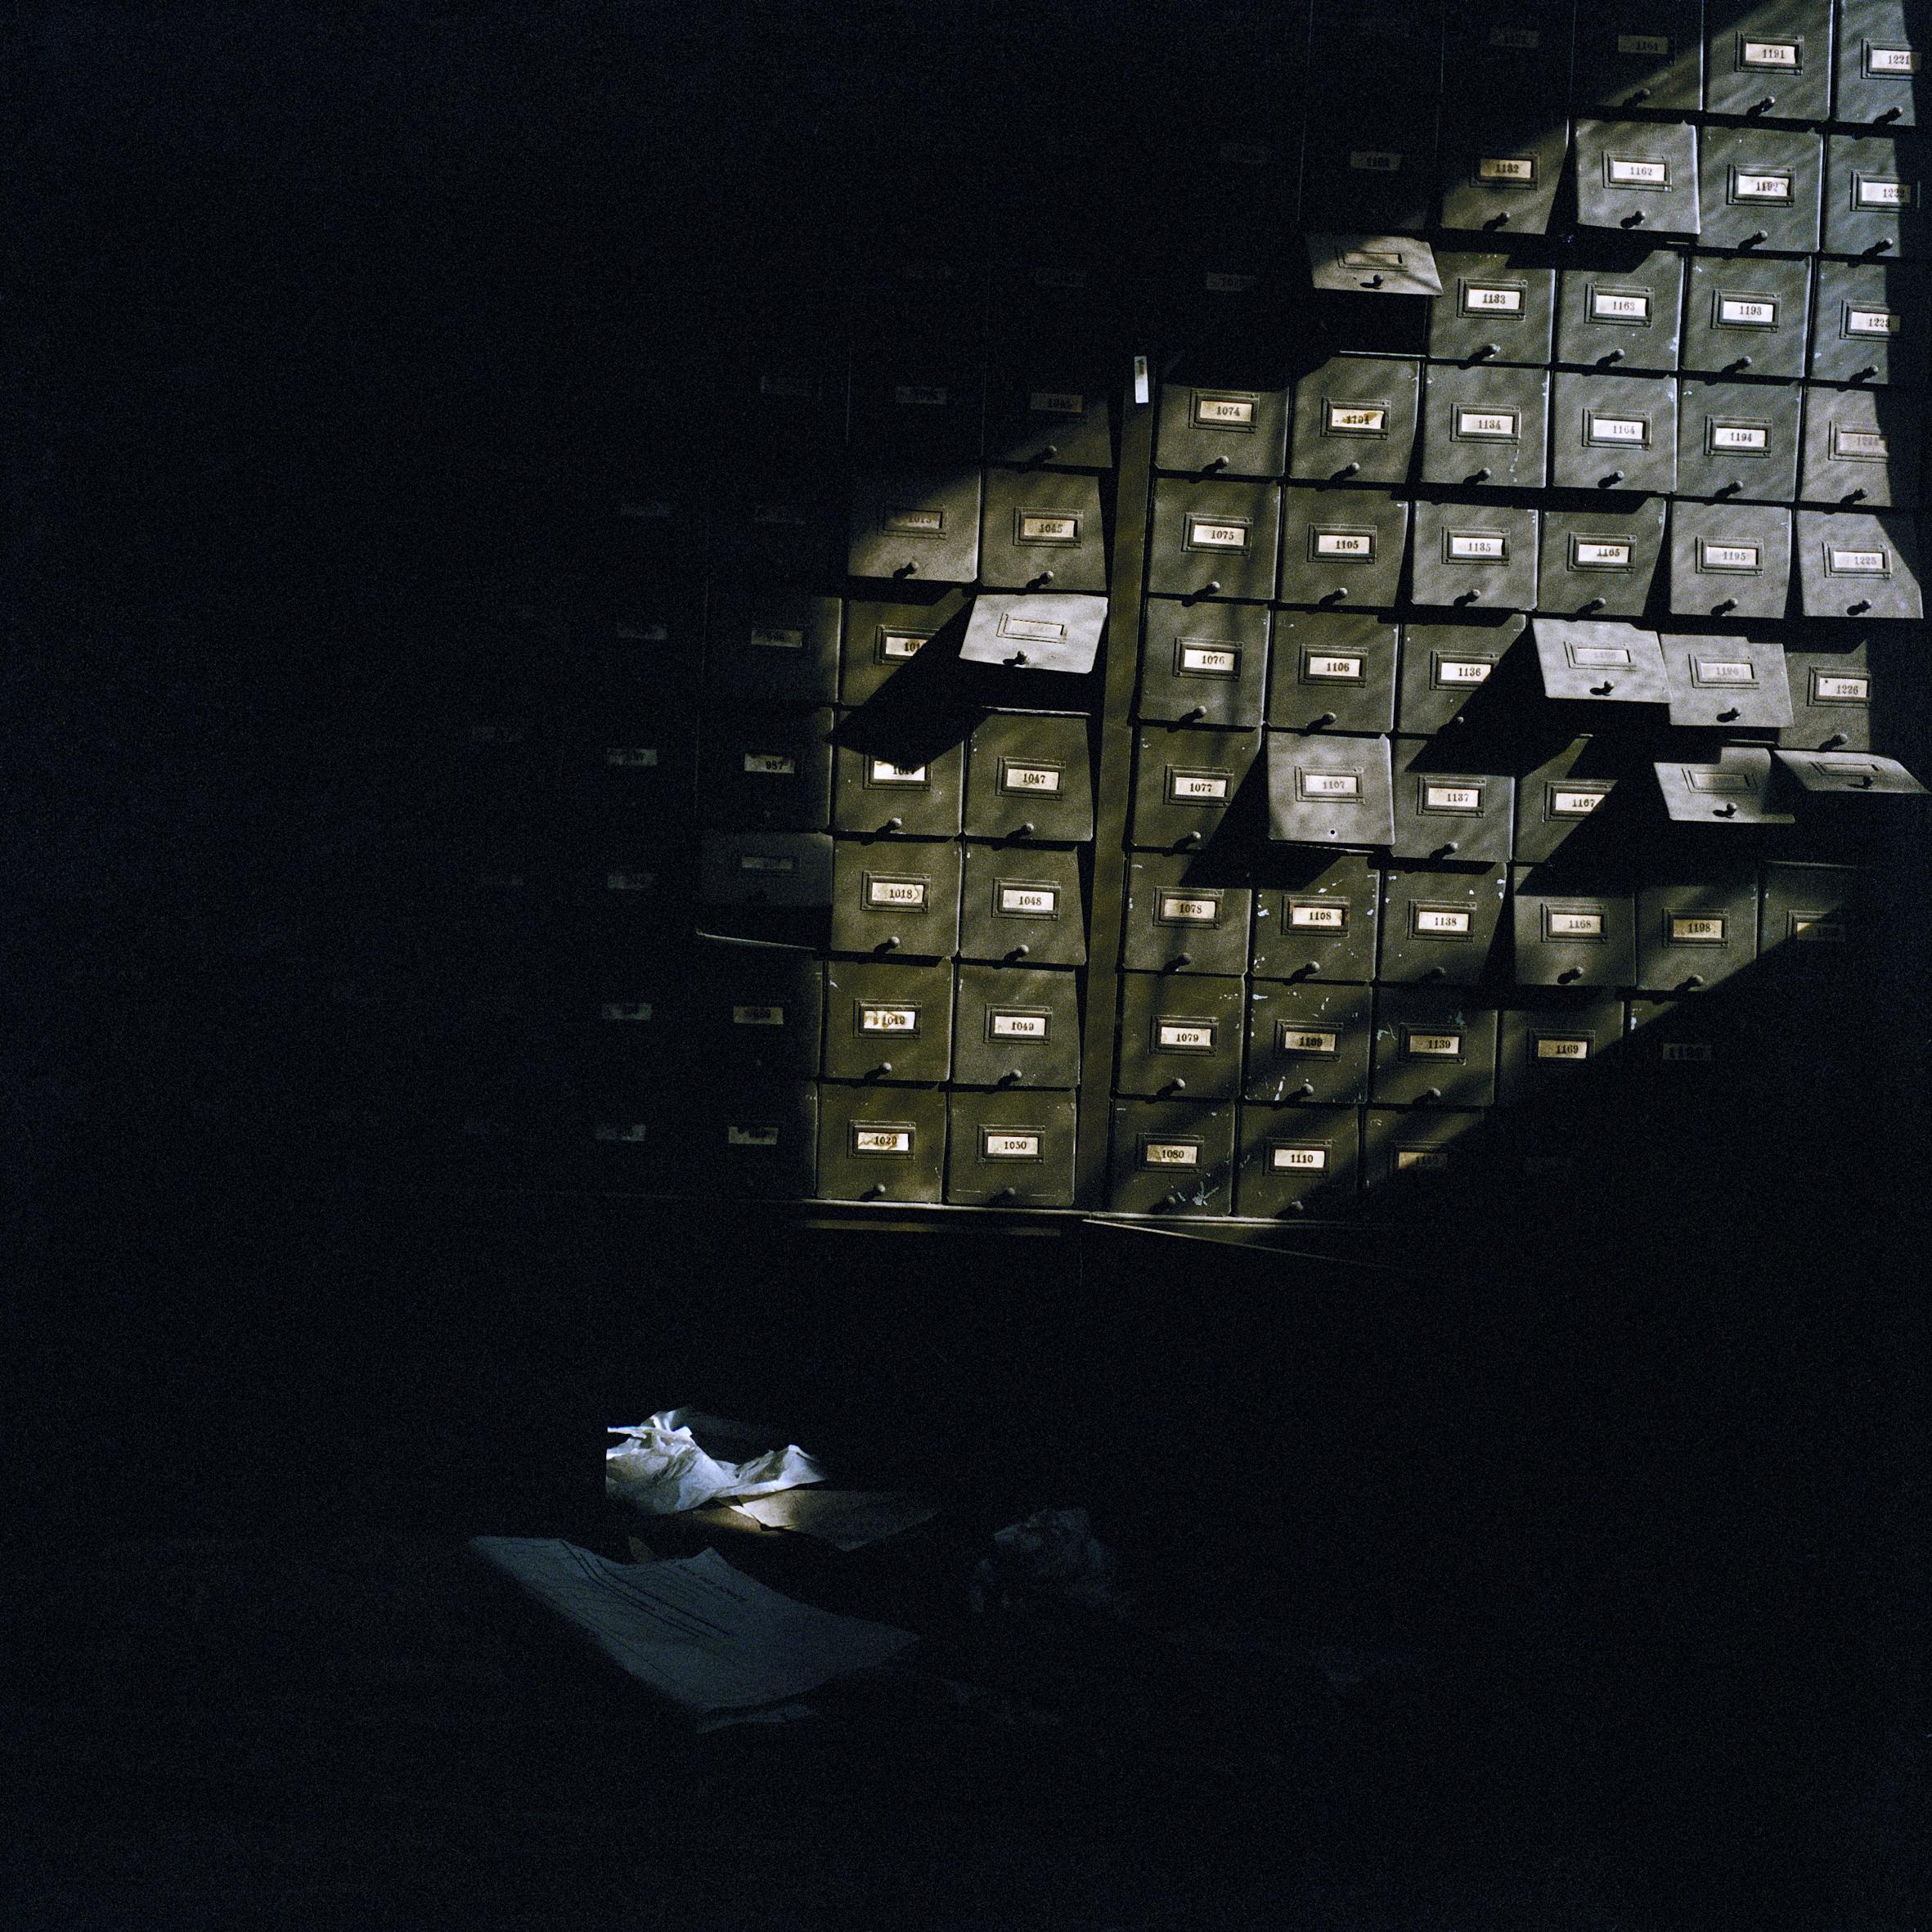 Filing Cabinets (1998)